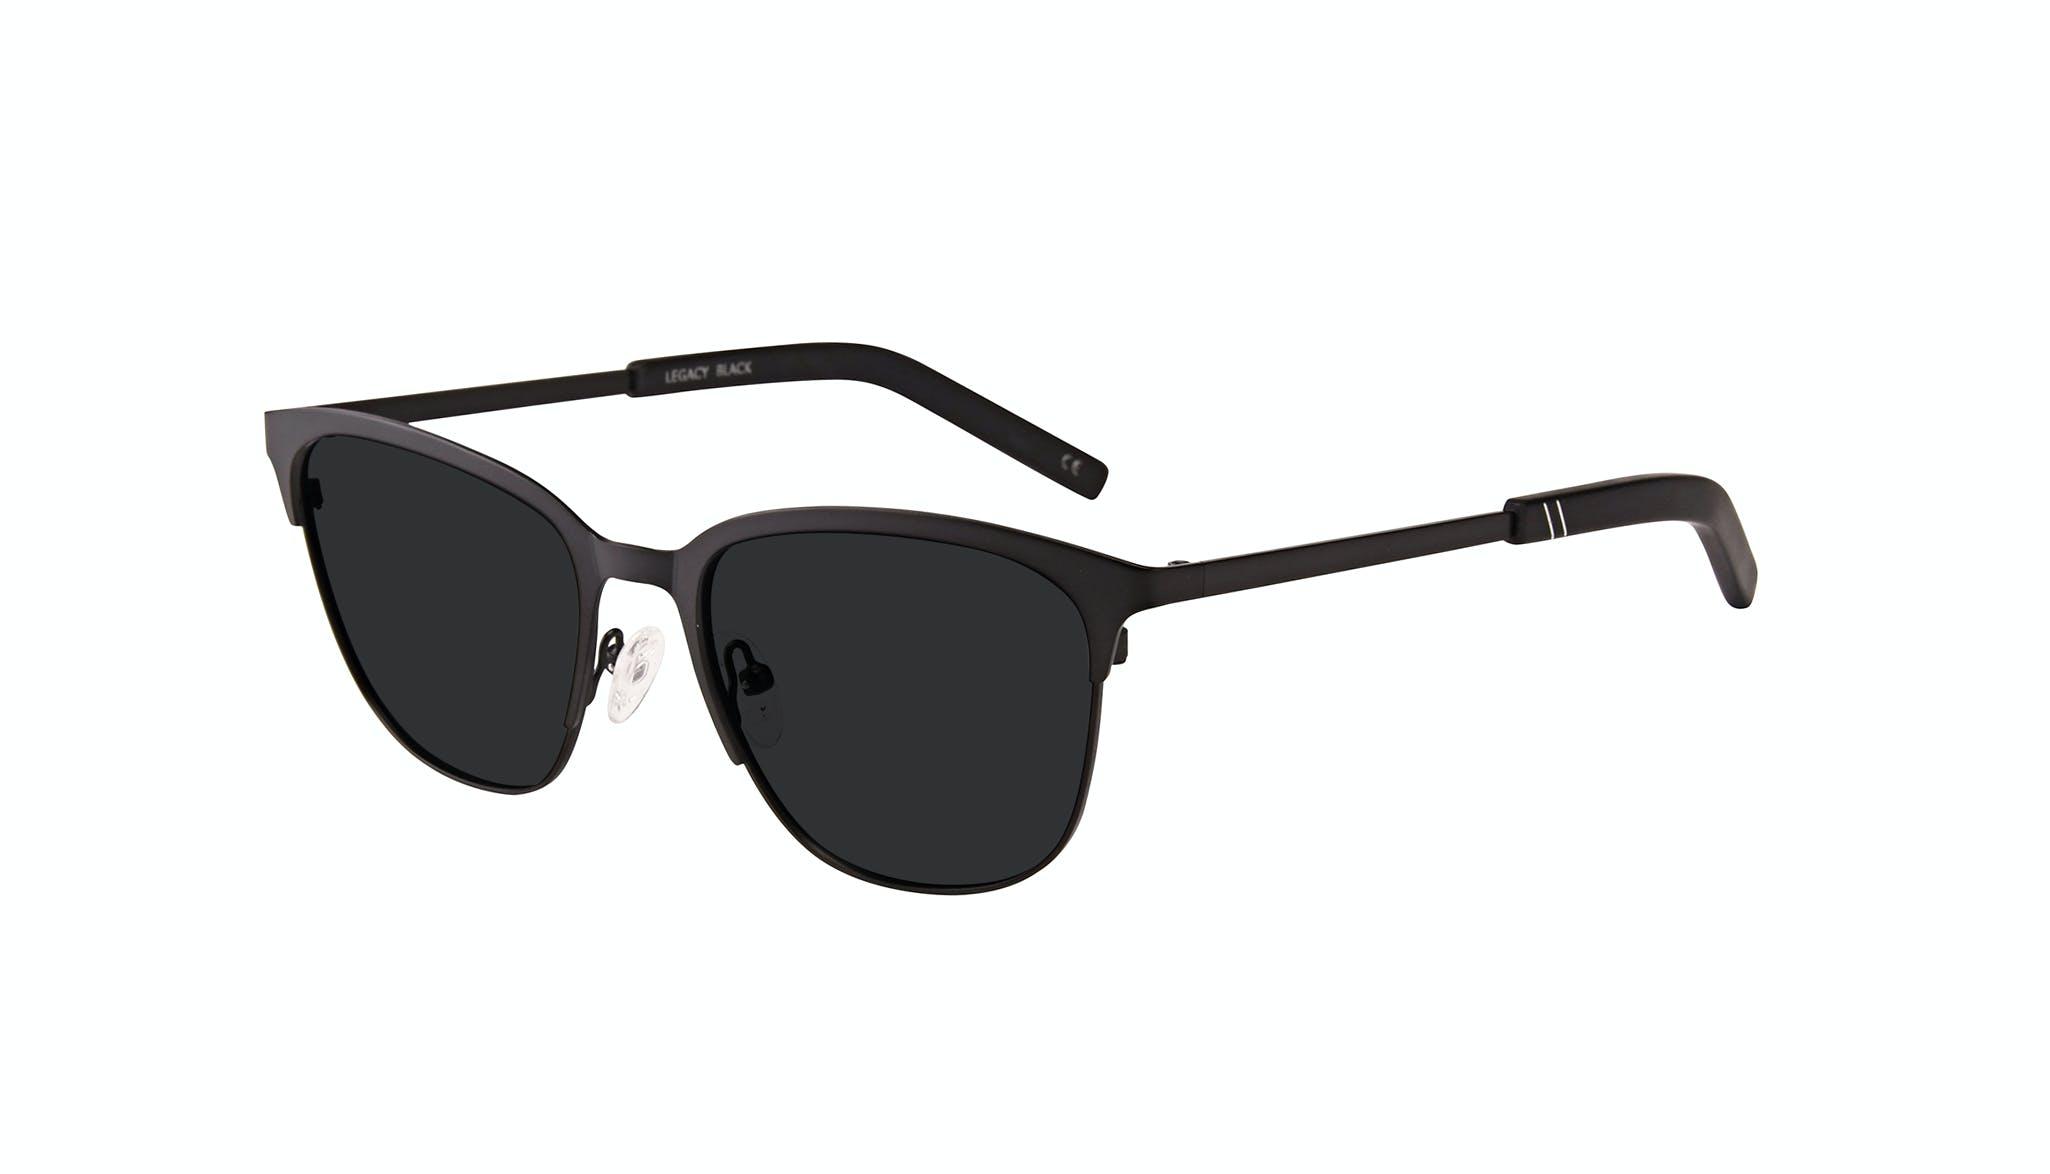 Affordable Fashion Glasses Rectangle Sunglasses Men Legacy Black Tilt